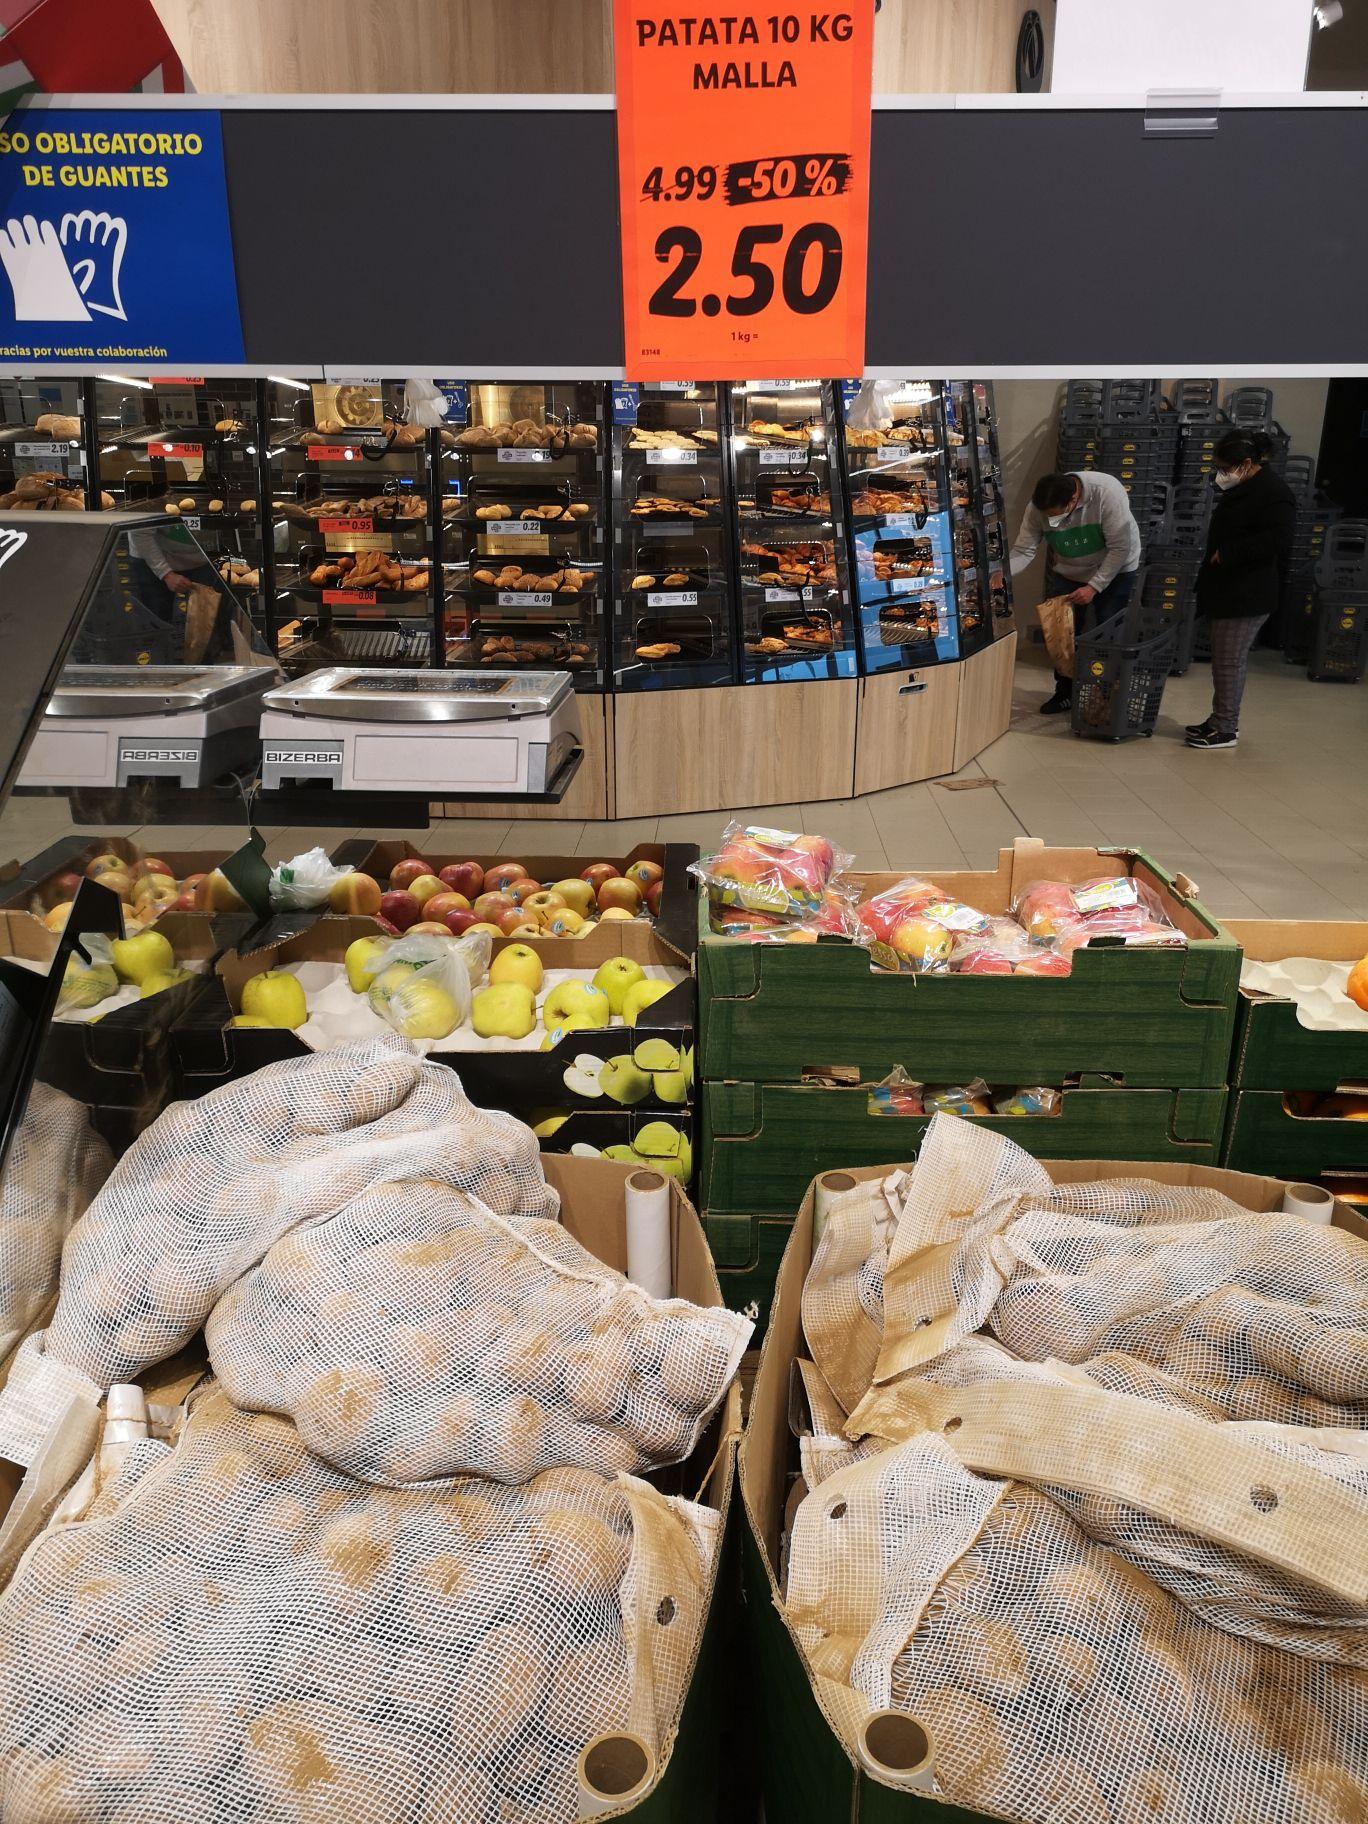 Patata, malla 10 kg/ 0,25€kg (Lidl avenida campones, 26,Gijón)